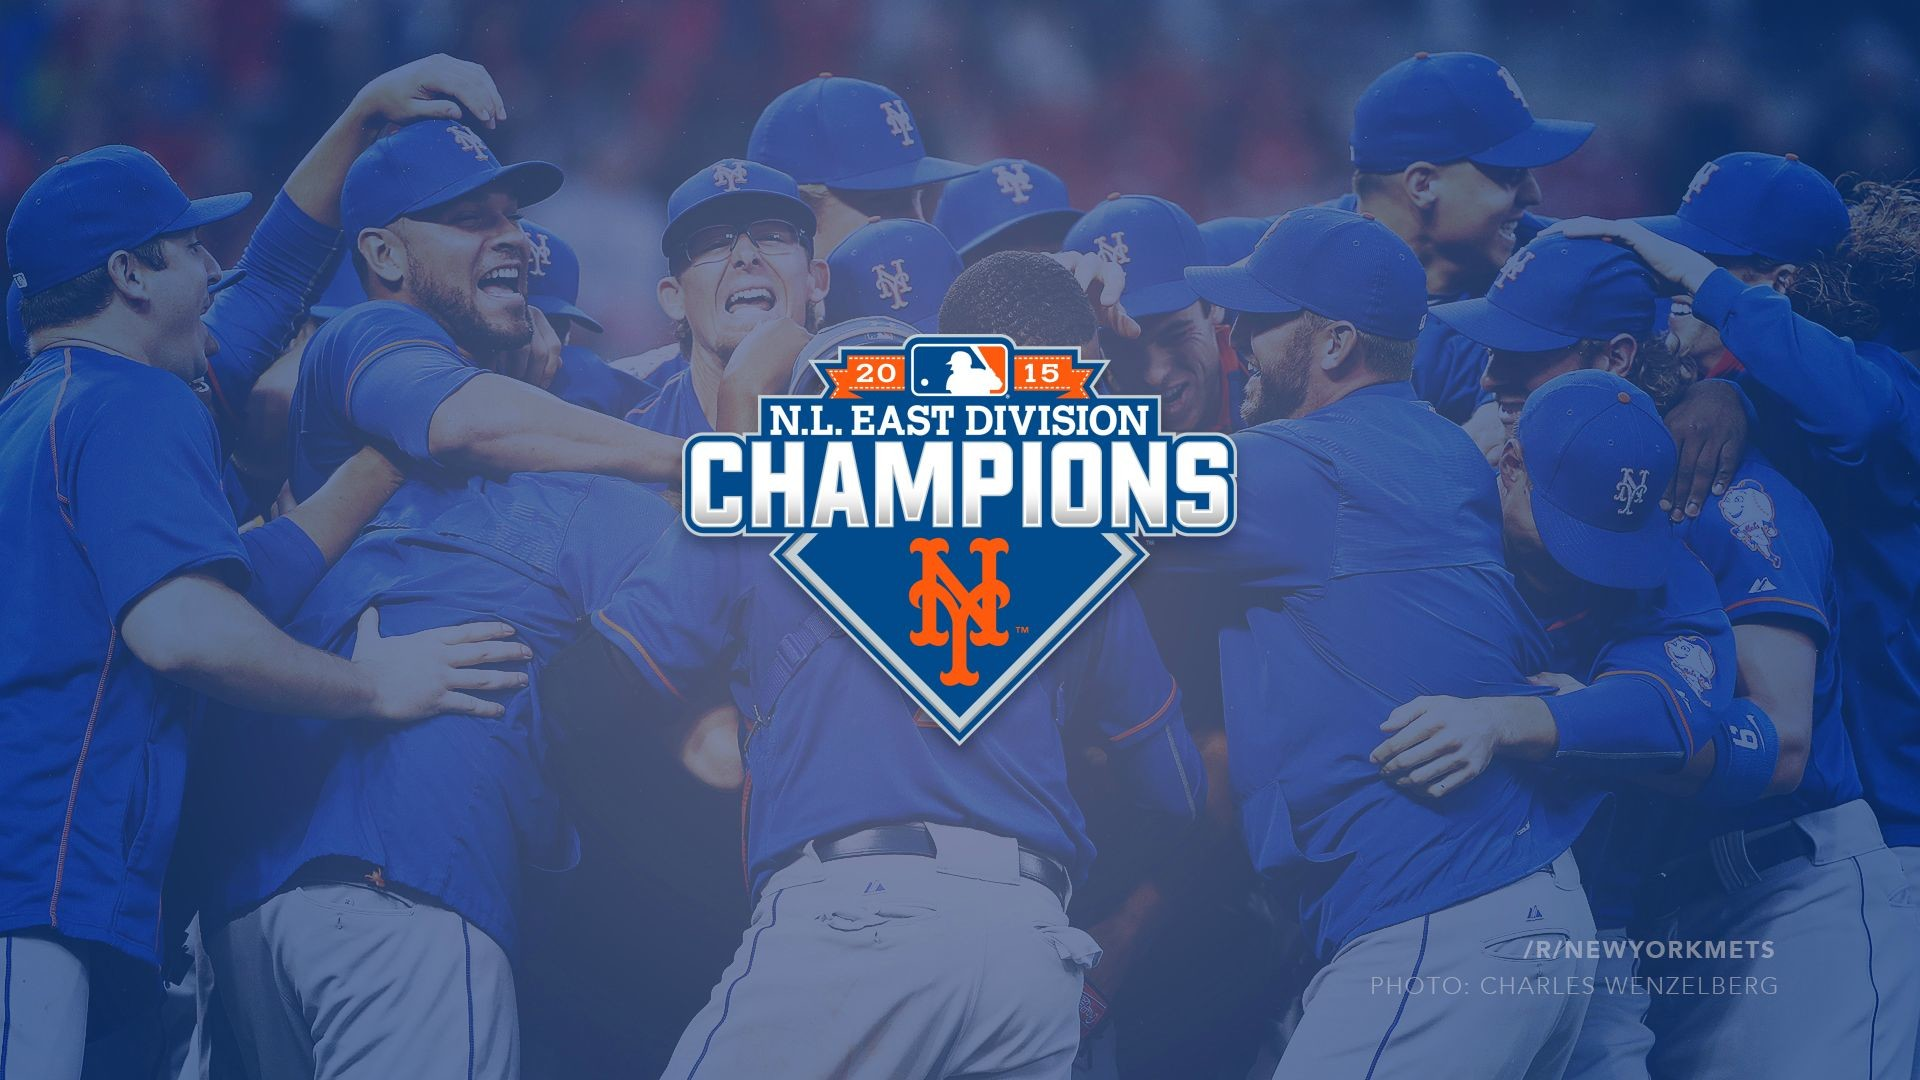 ImageNew York Mets – 2015 NL East Champs Wallpaper …